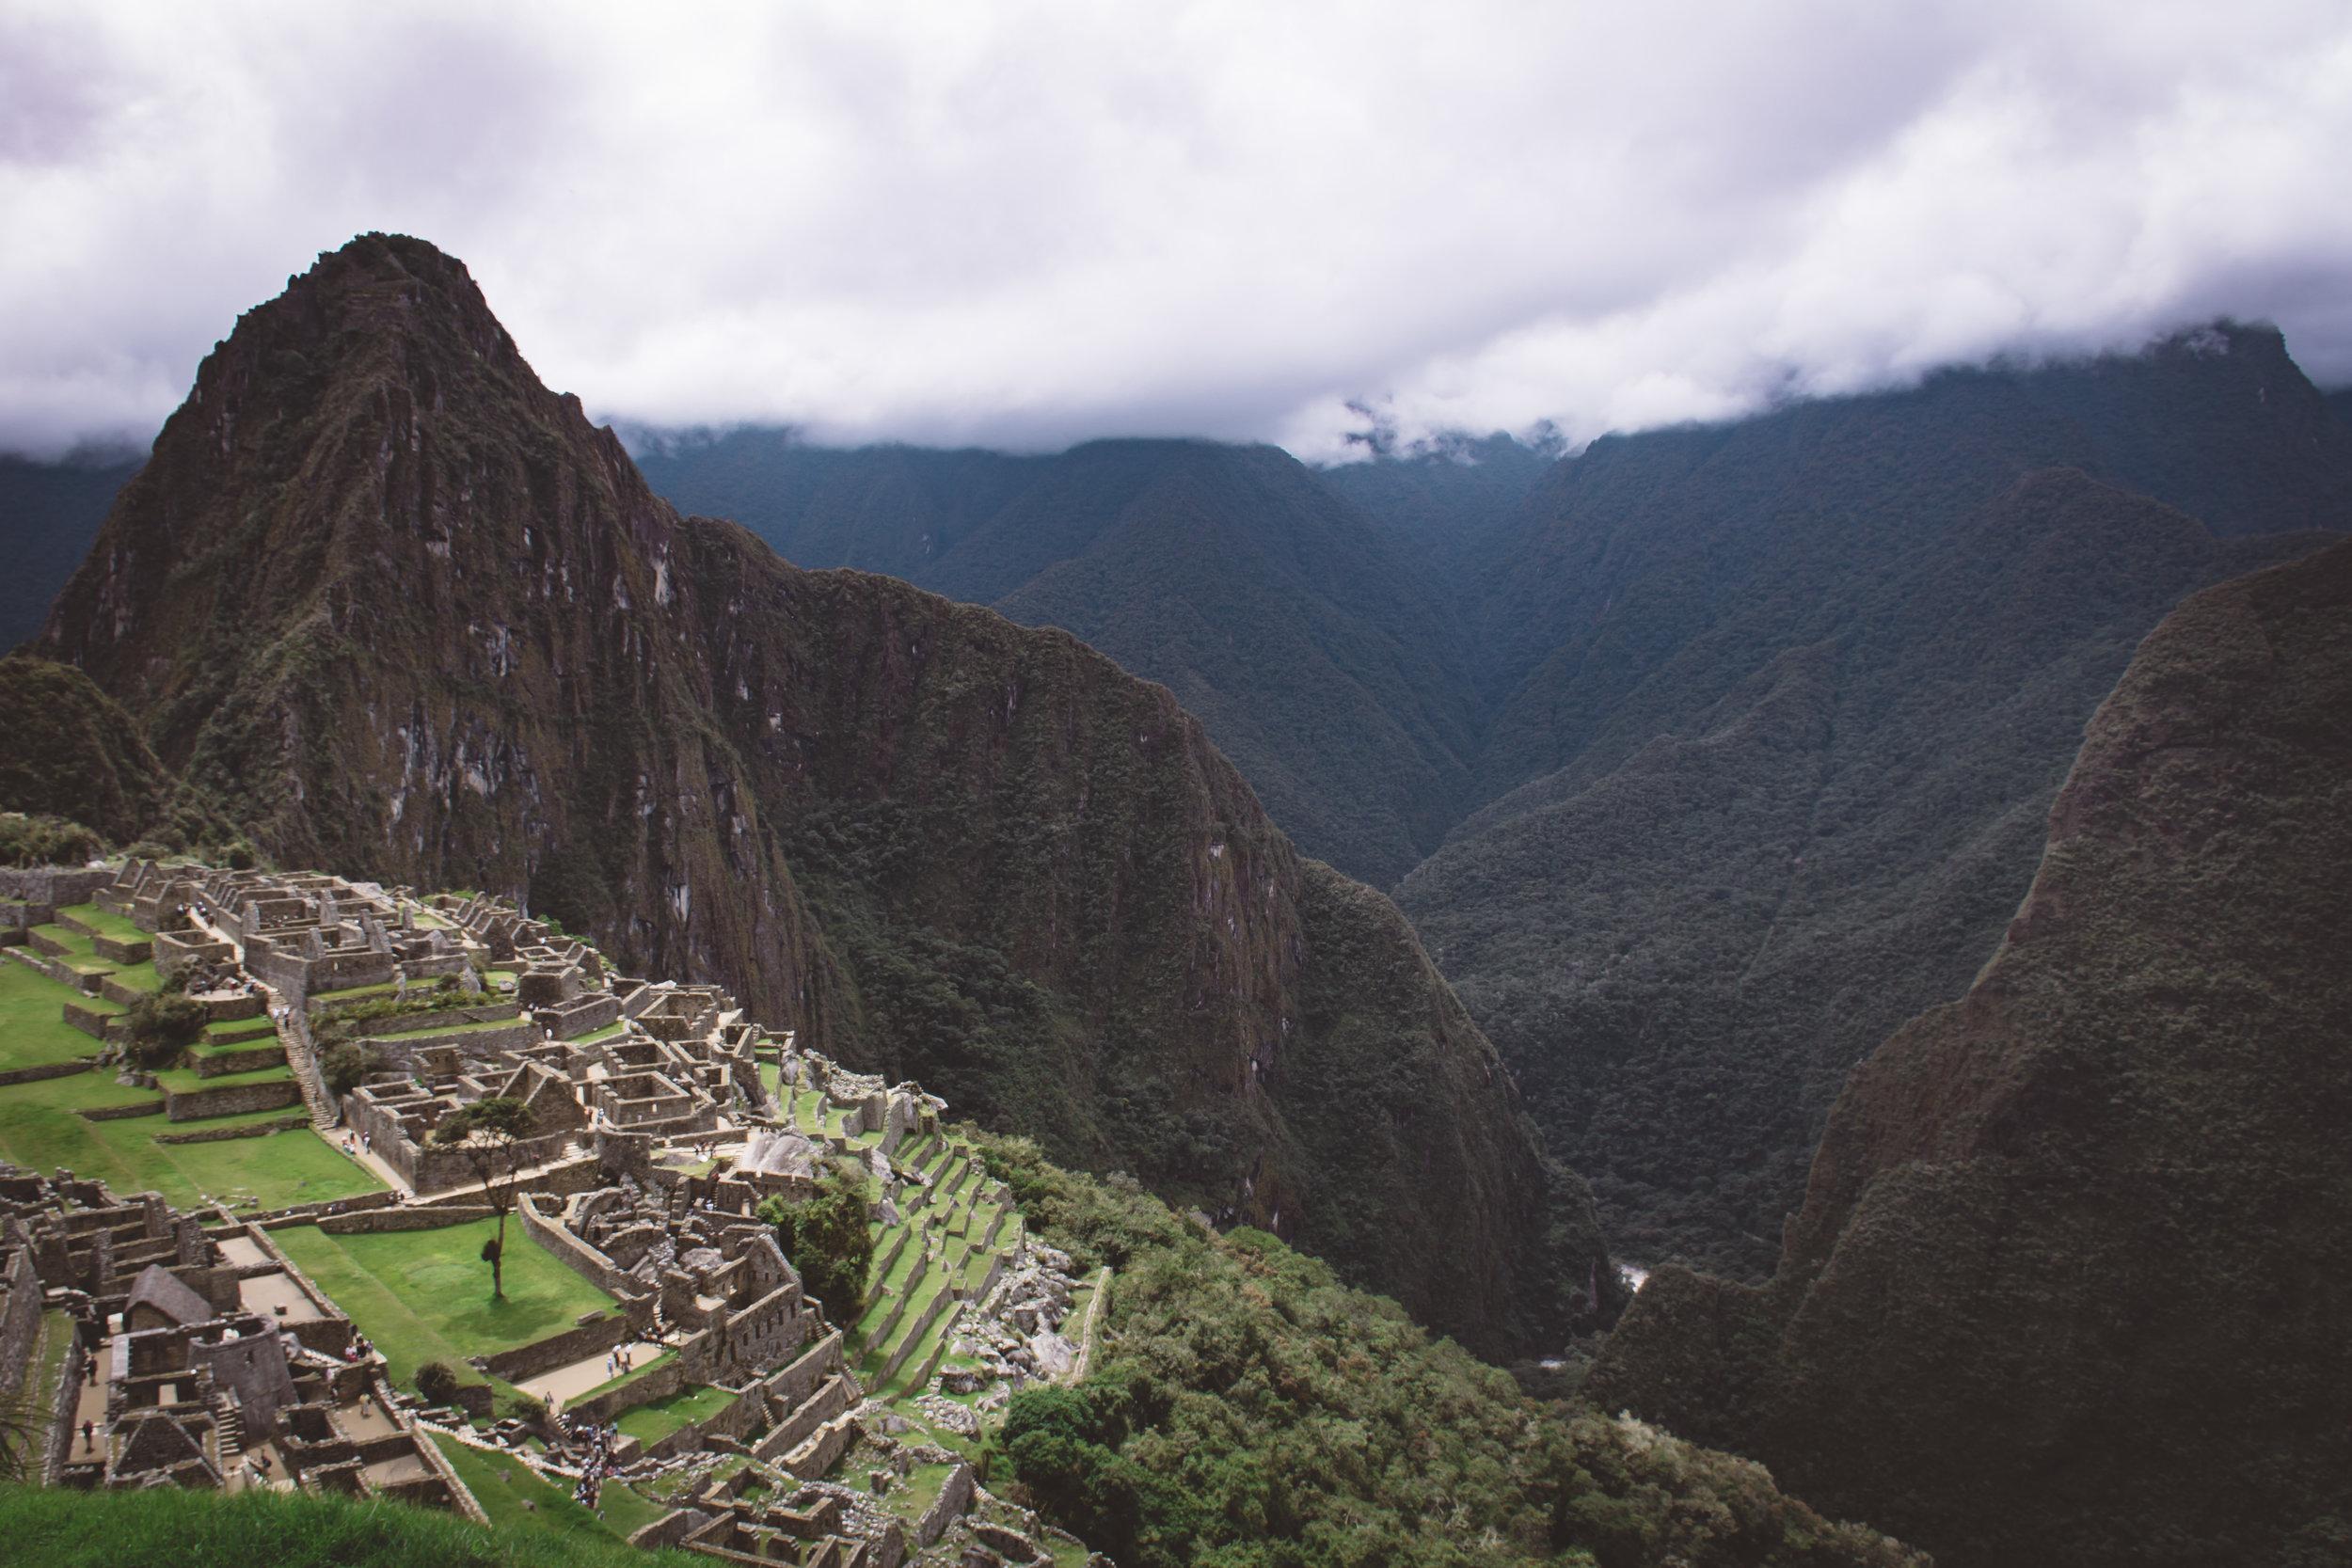 Macchu Picchu with a view of Huayna Picchu